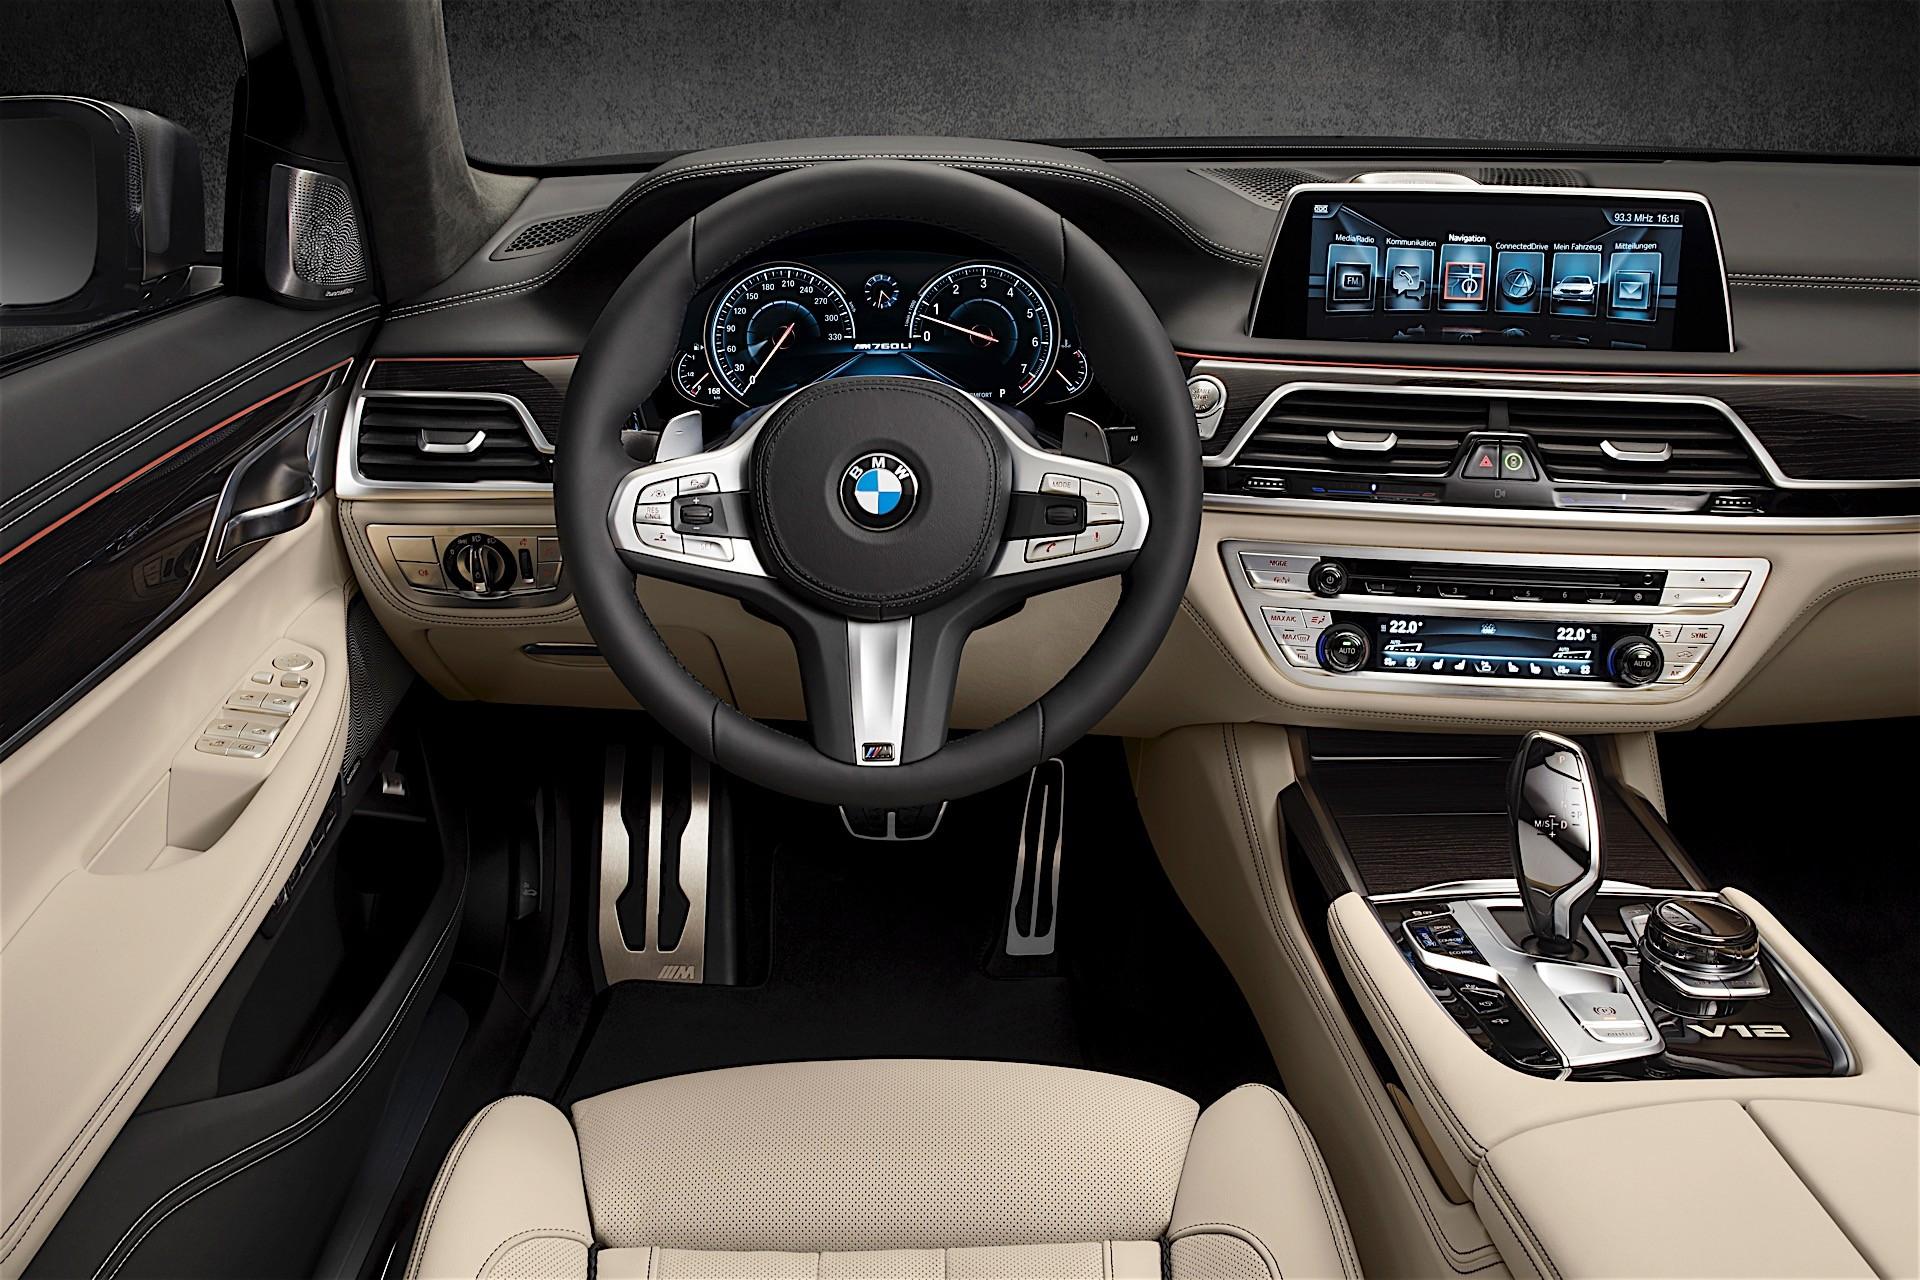 BMW Reveals New M760Li, It Has a V12 with 600 HP - autoevolution